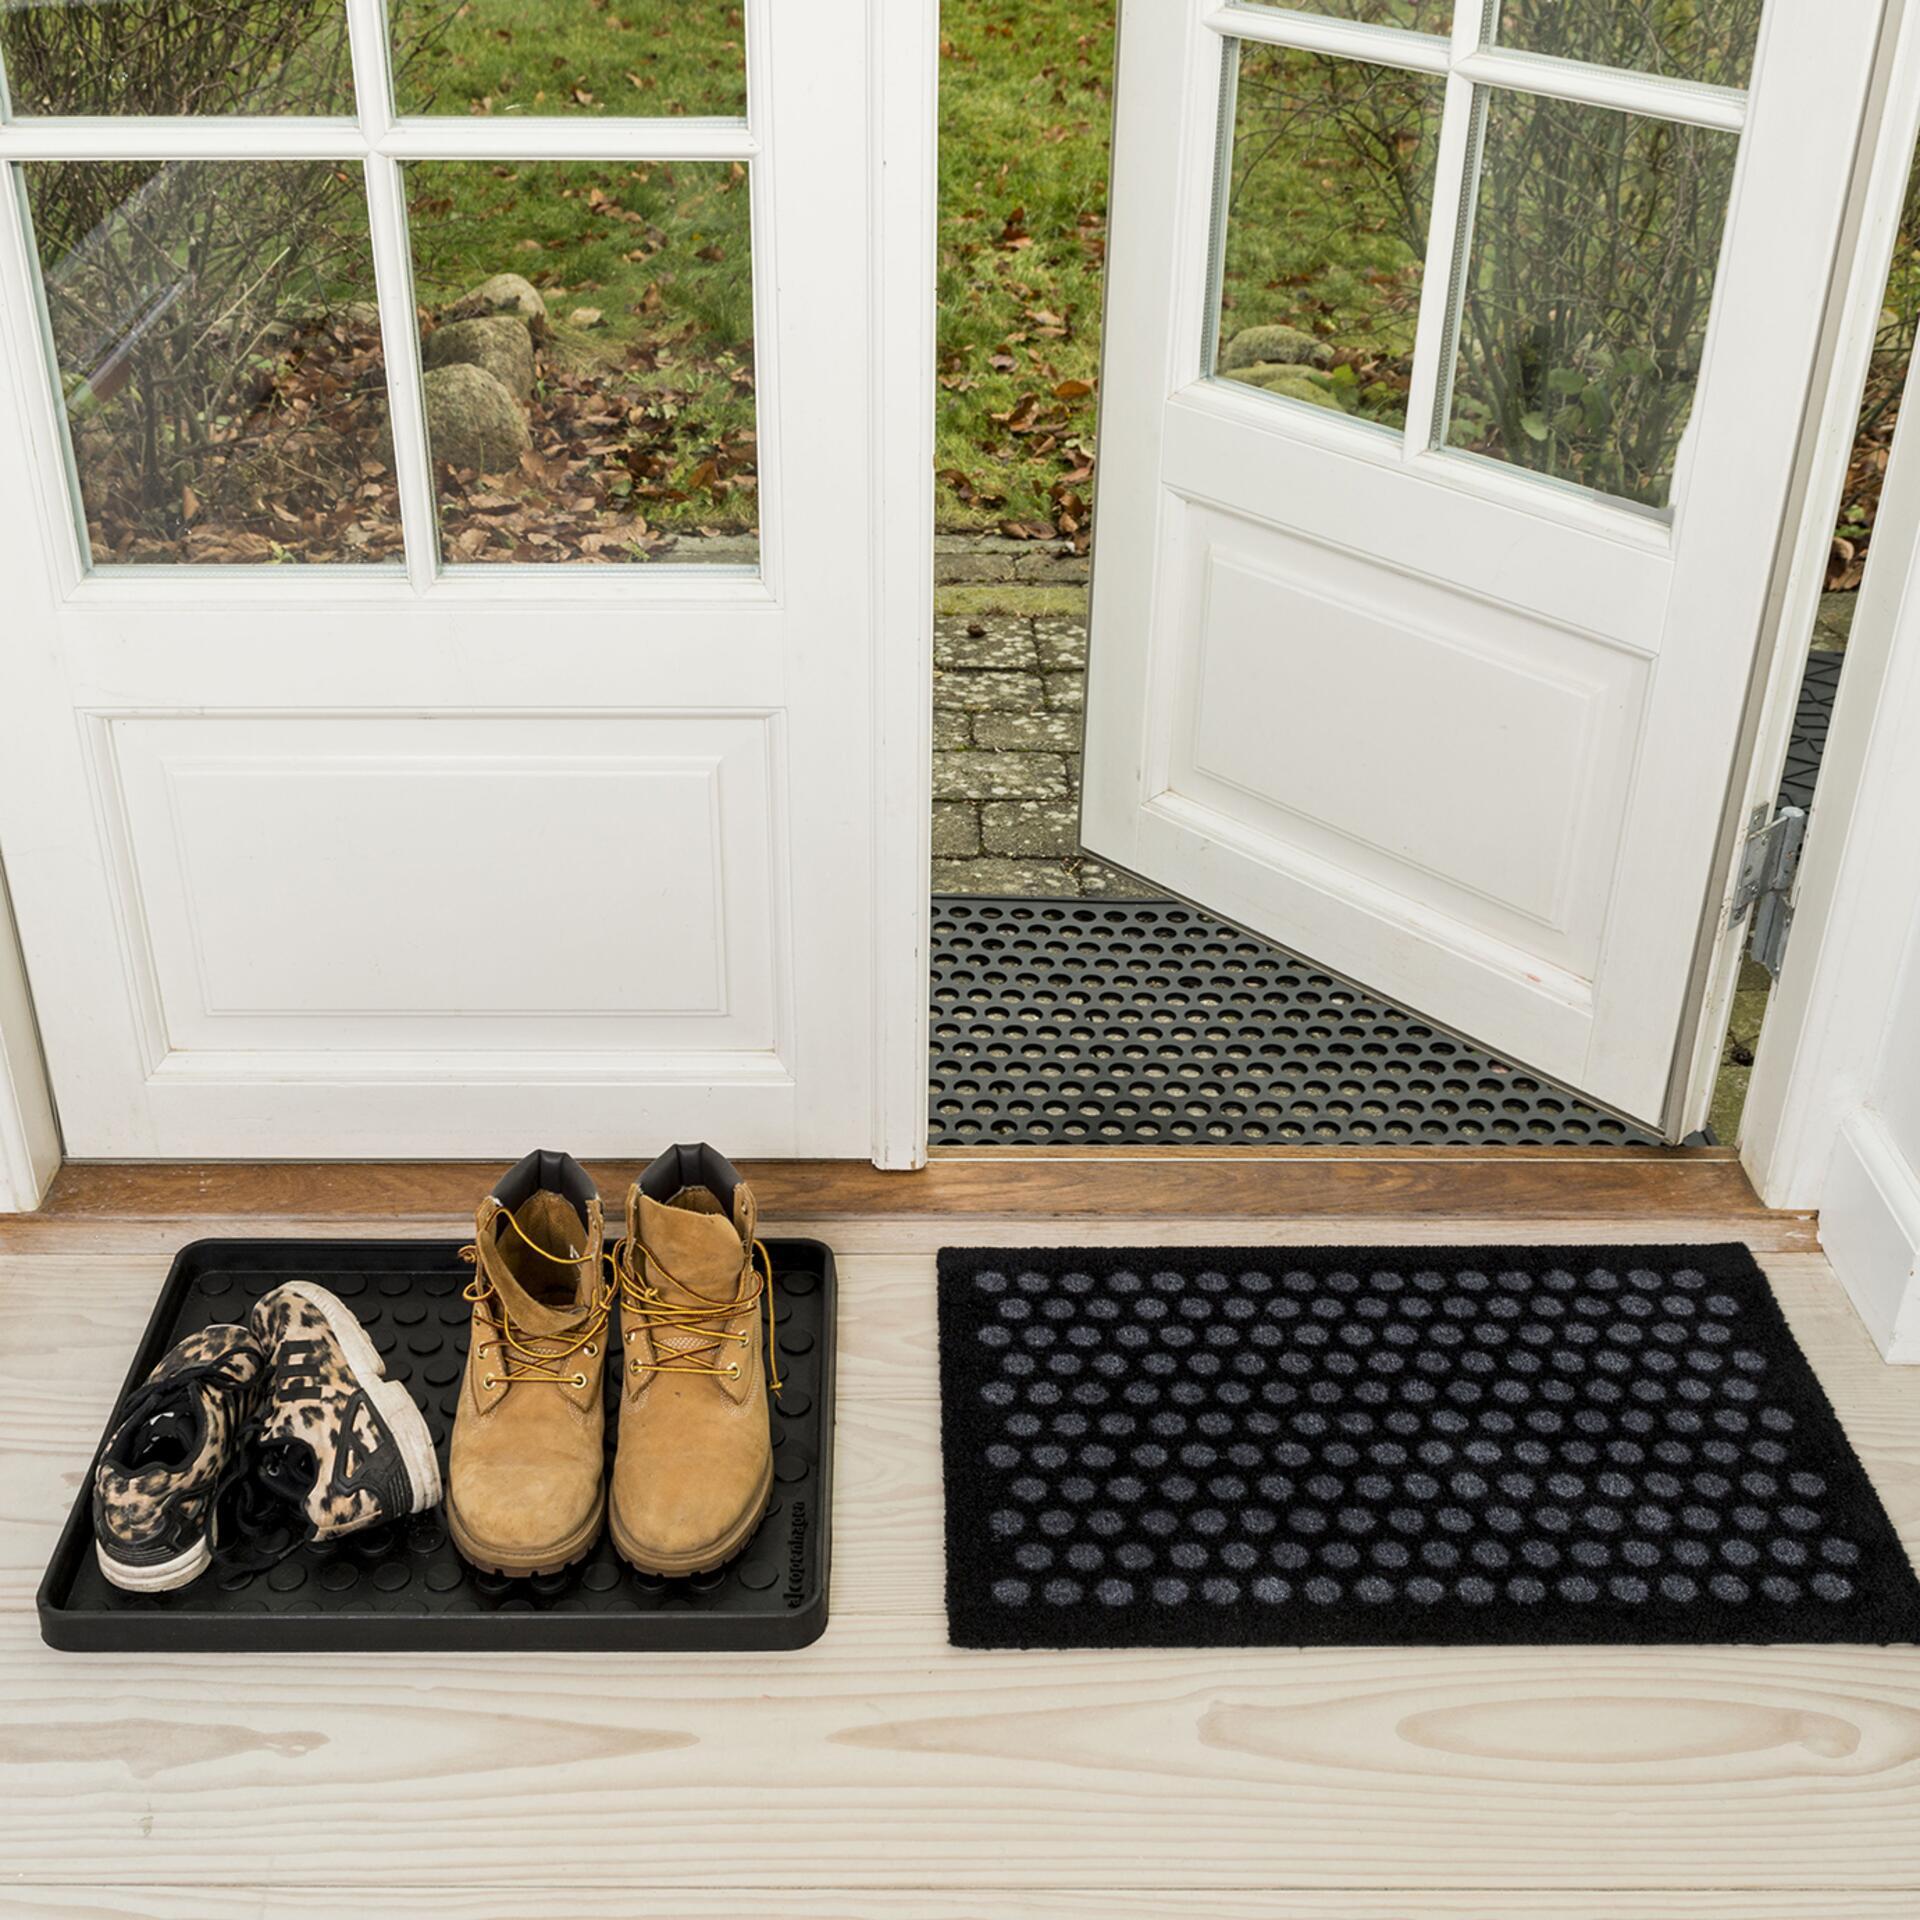 Tica Fußmatte aus recyceltem Gummi 60x90 cm